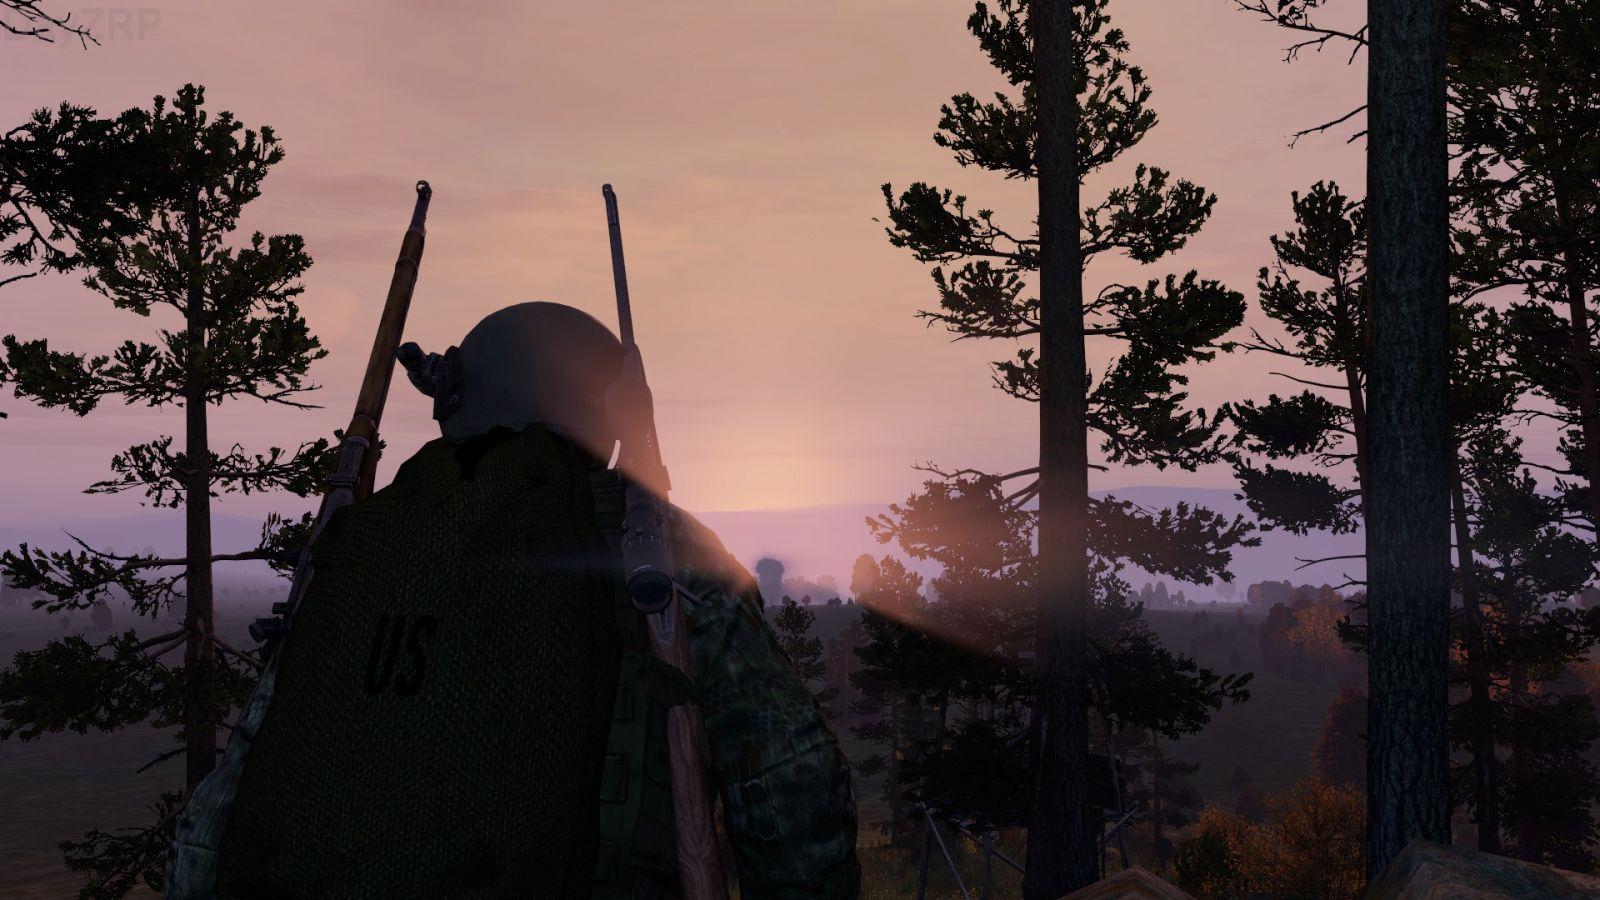 The last sunset ...